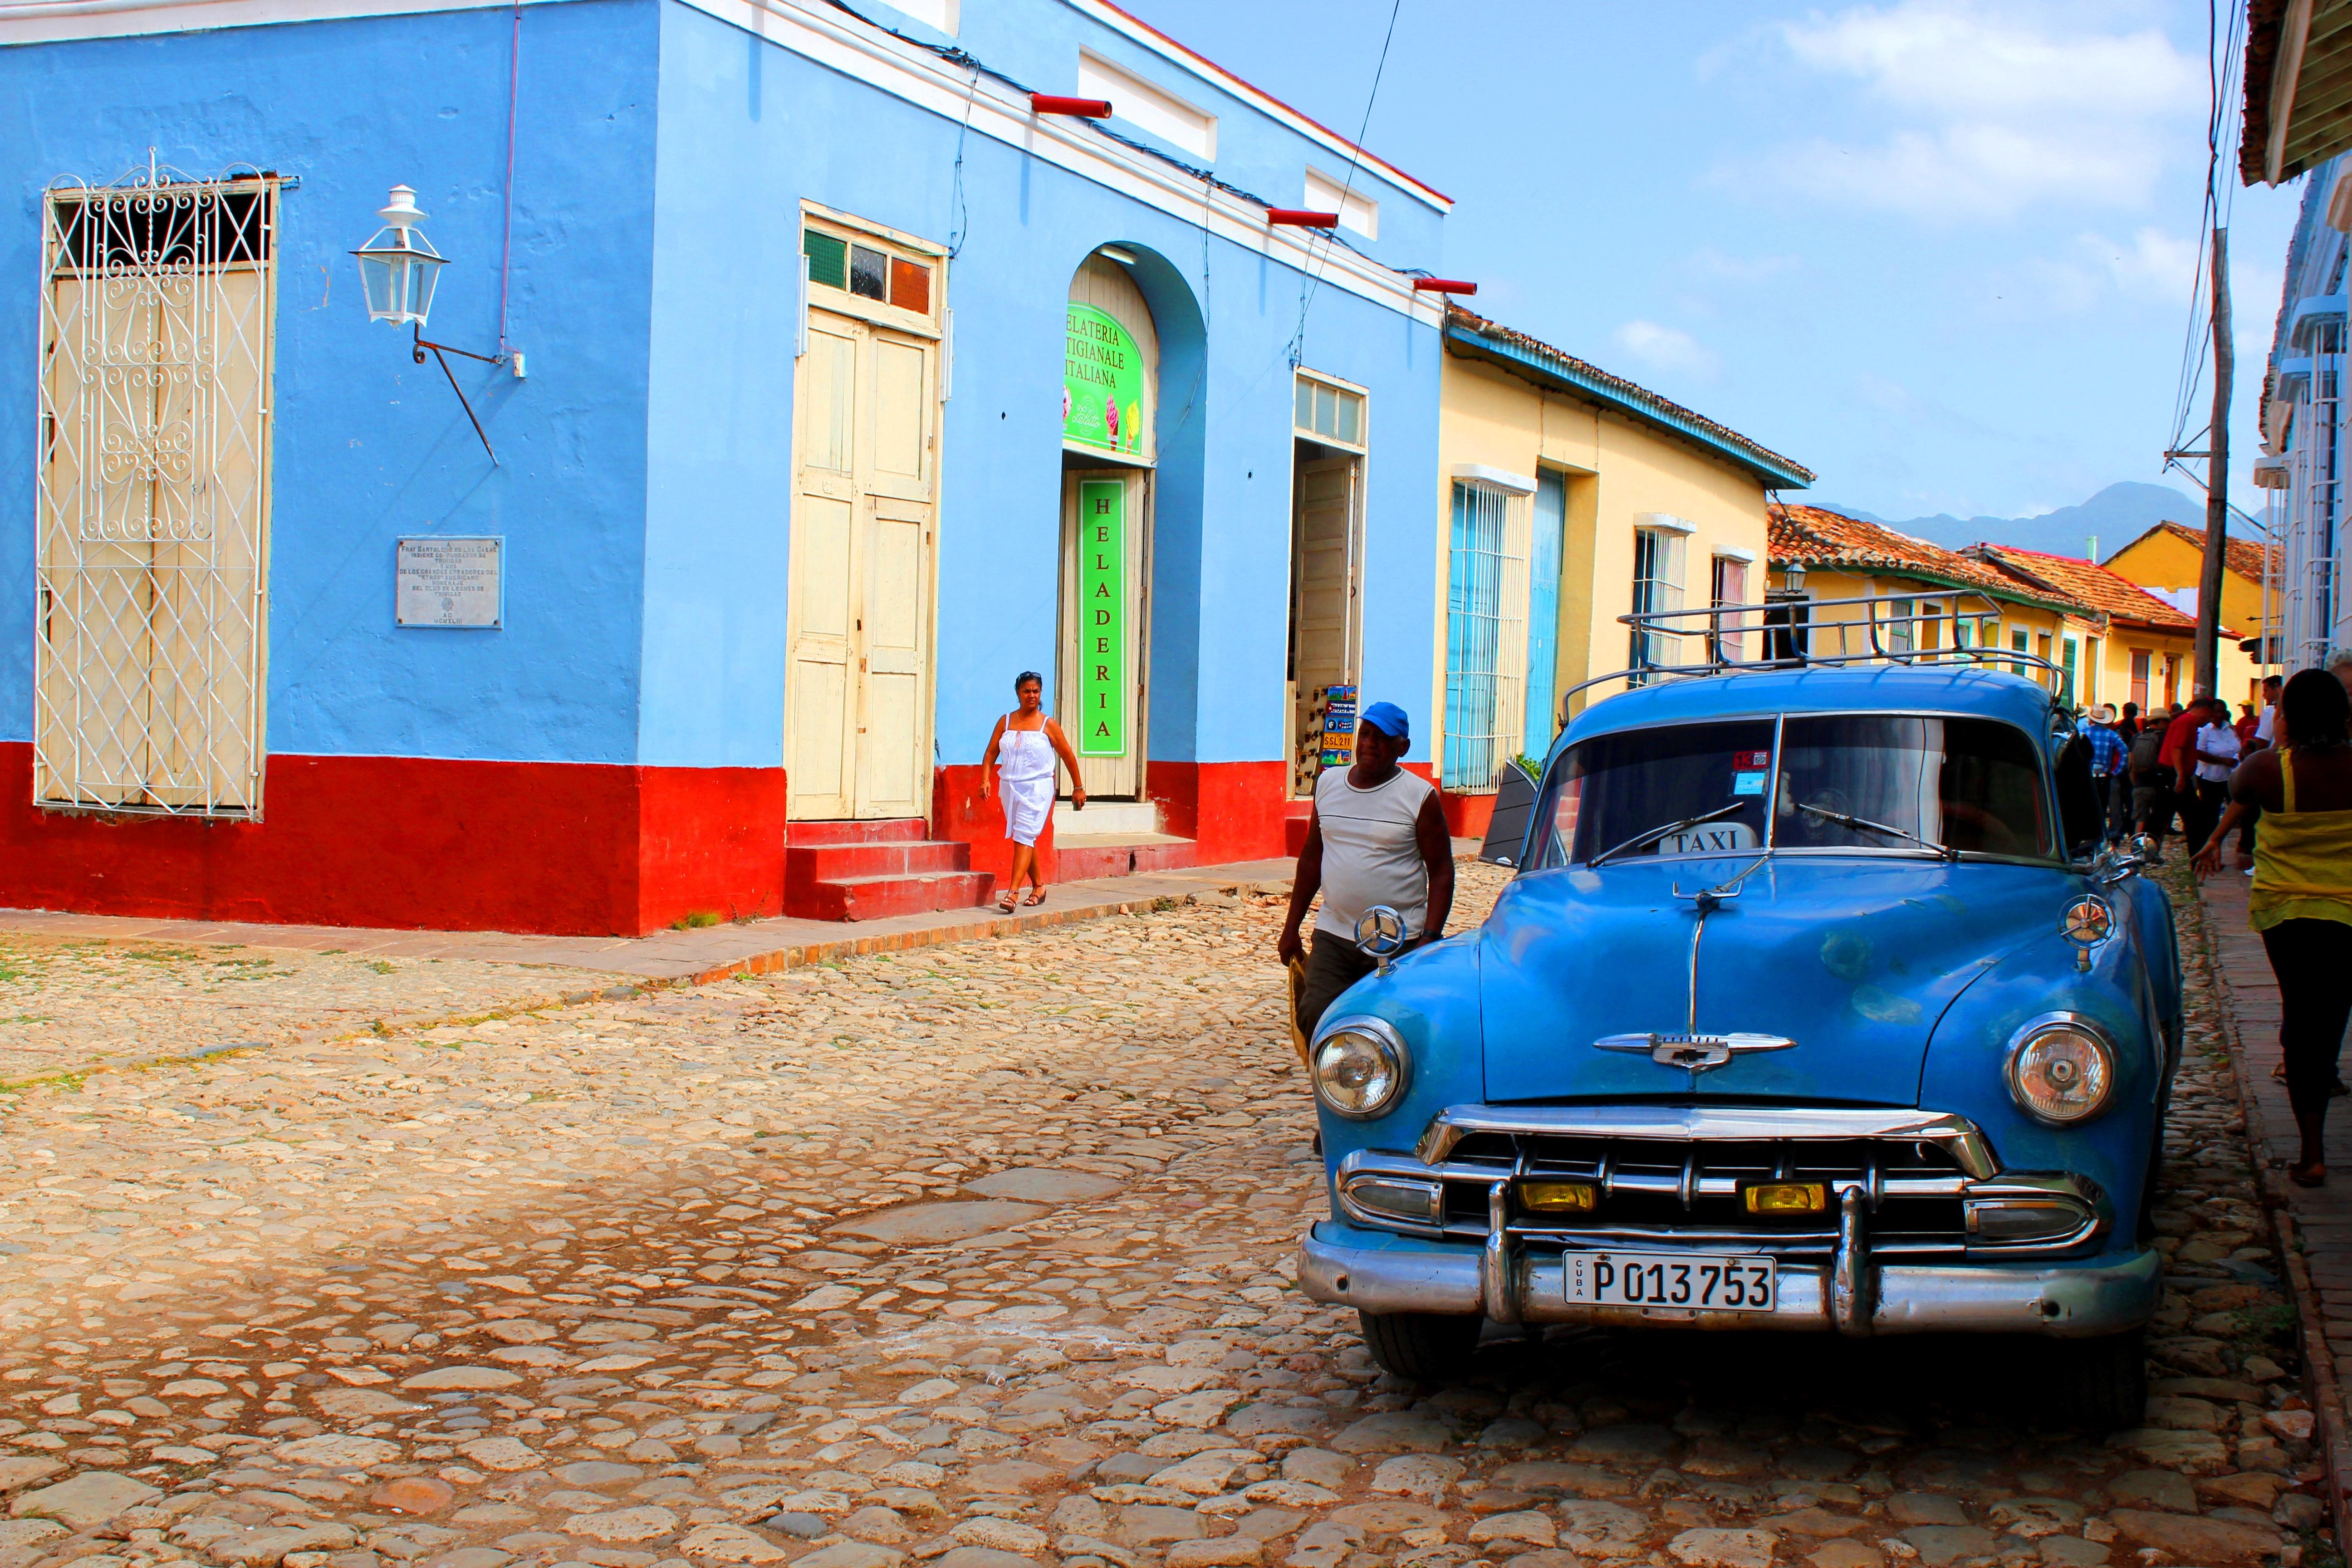 Wallpaper Life Morning Blue Cars 60s Colours Havana